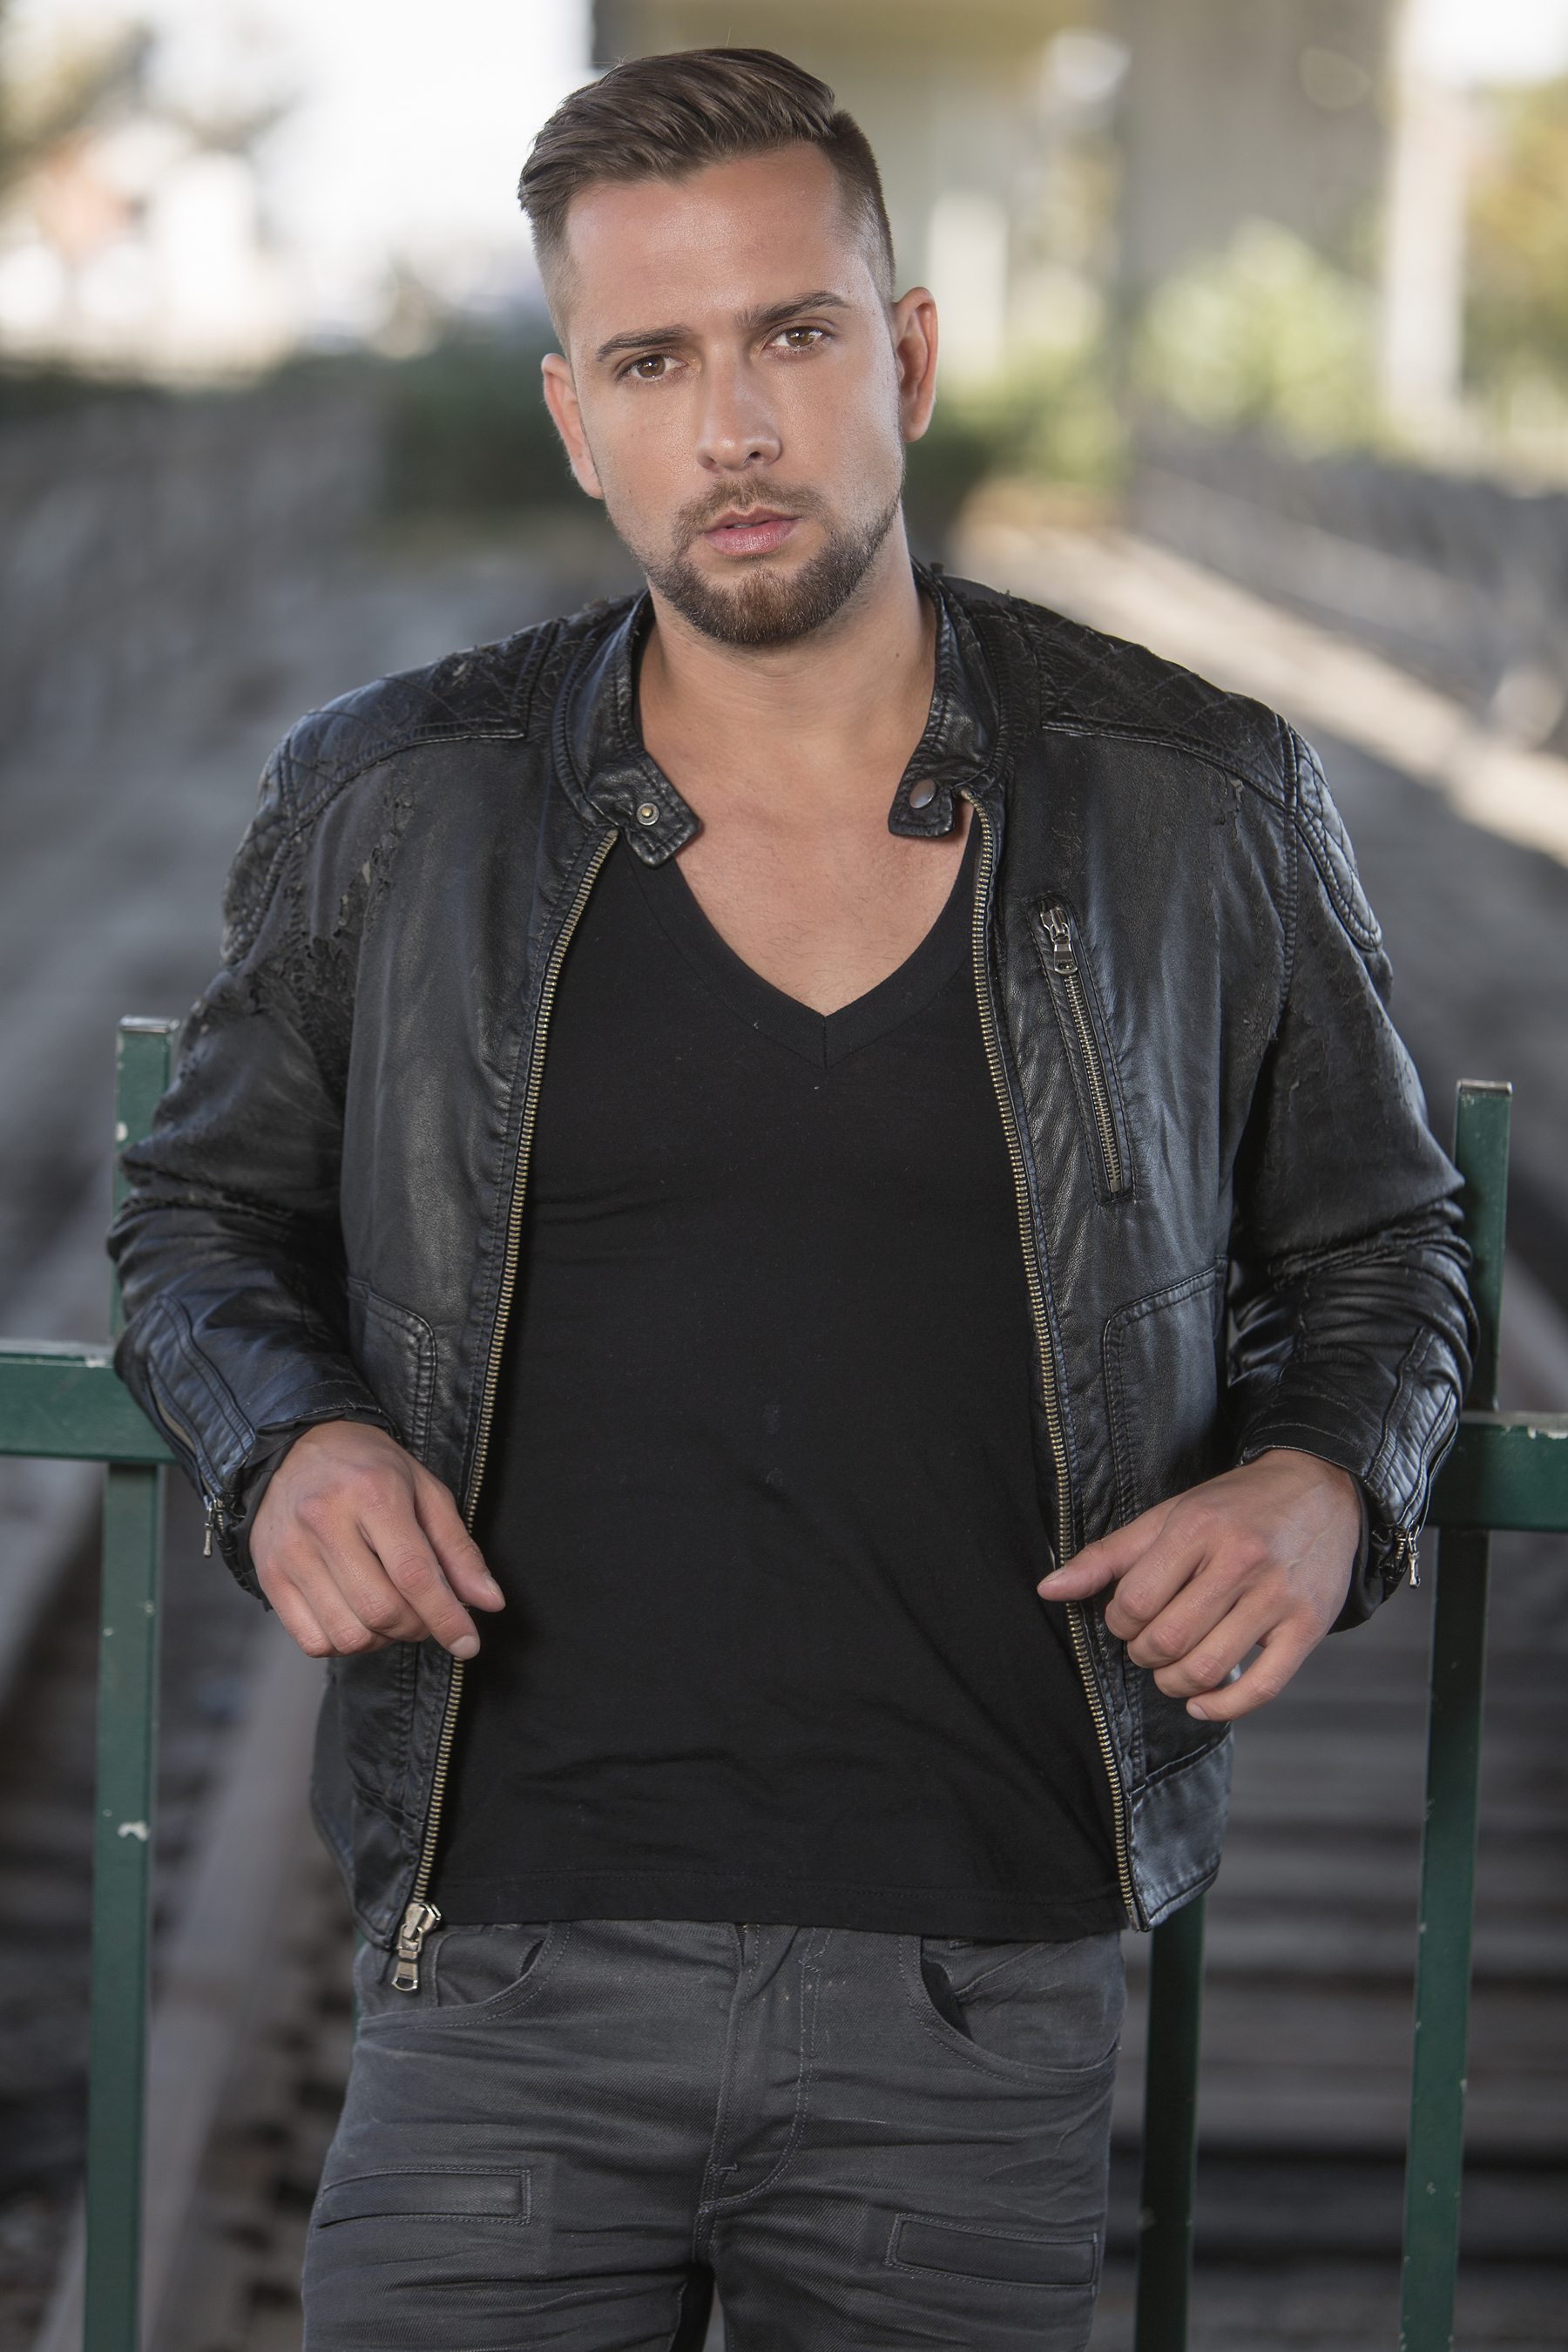 Special guest, recording star and American Idol alum,David Hernandez.